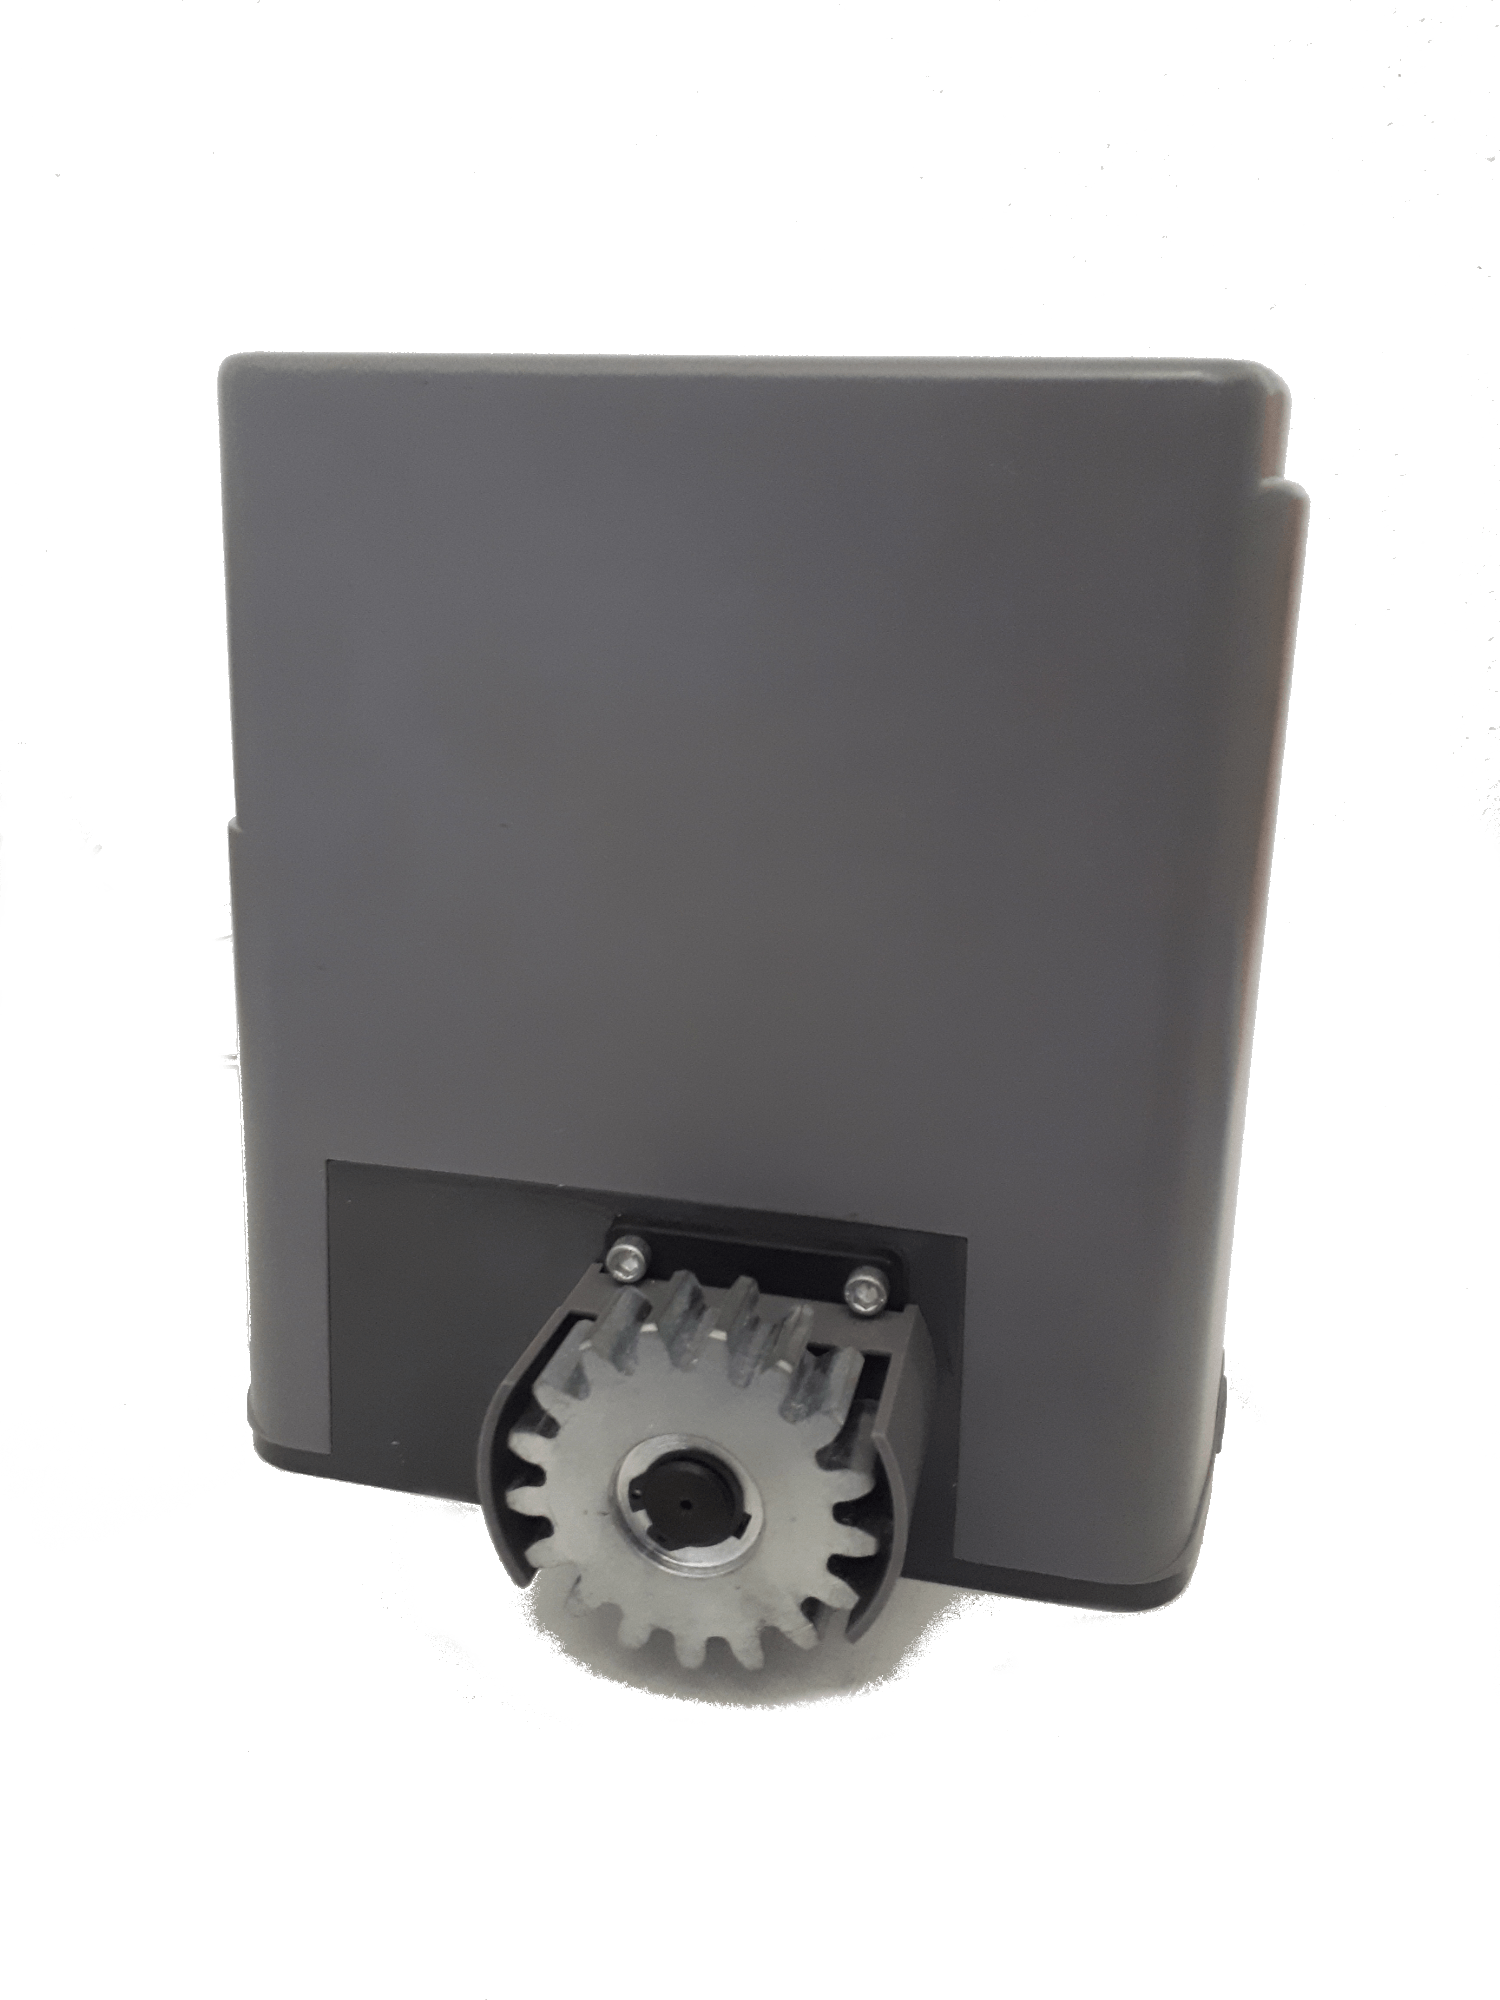 Kit instalmatic pro 600 motor puerta corredera con nylon for Kit motor puerta corredera